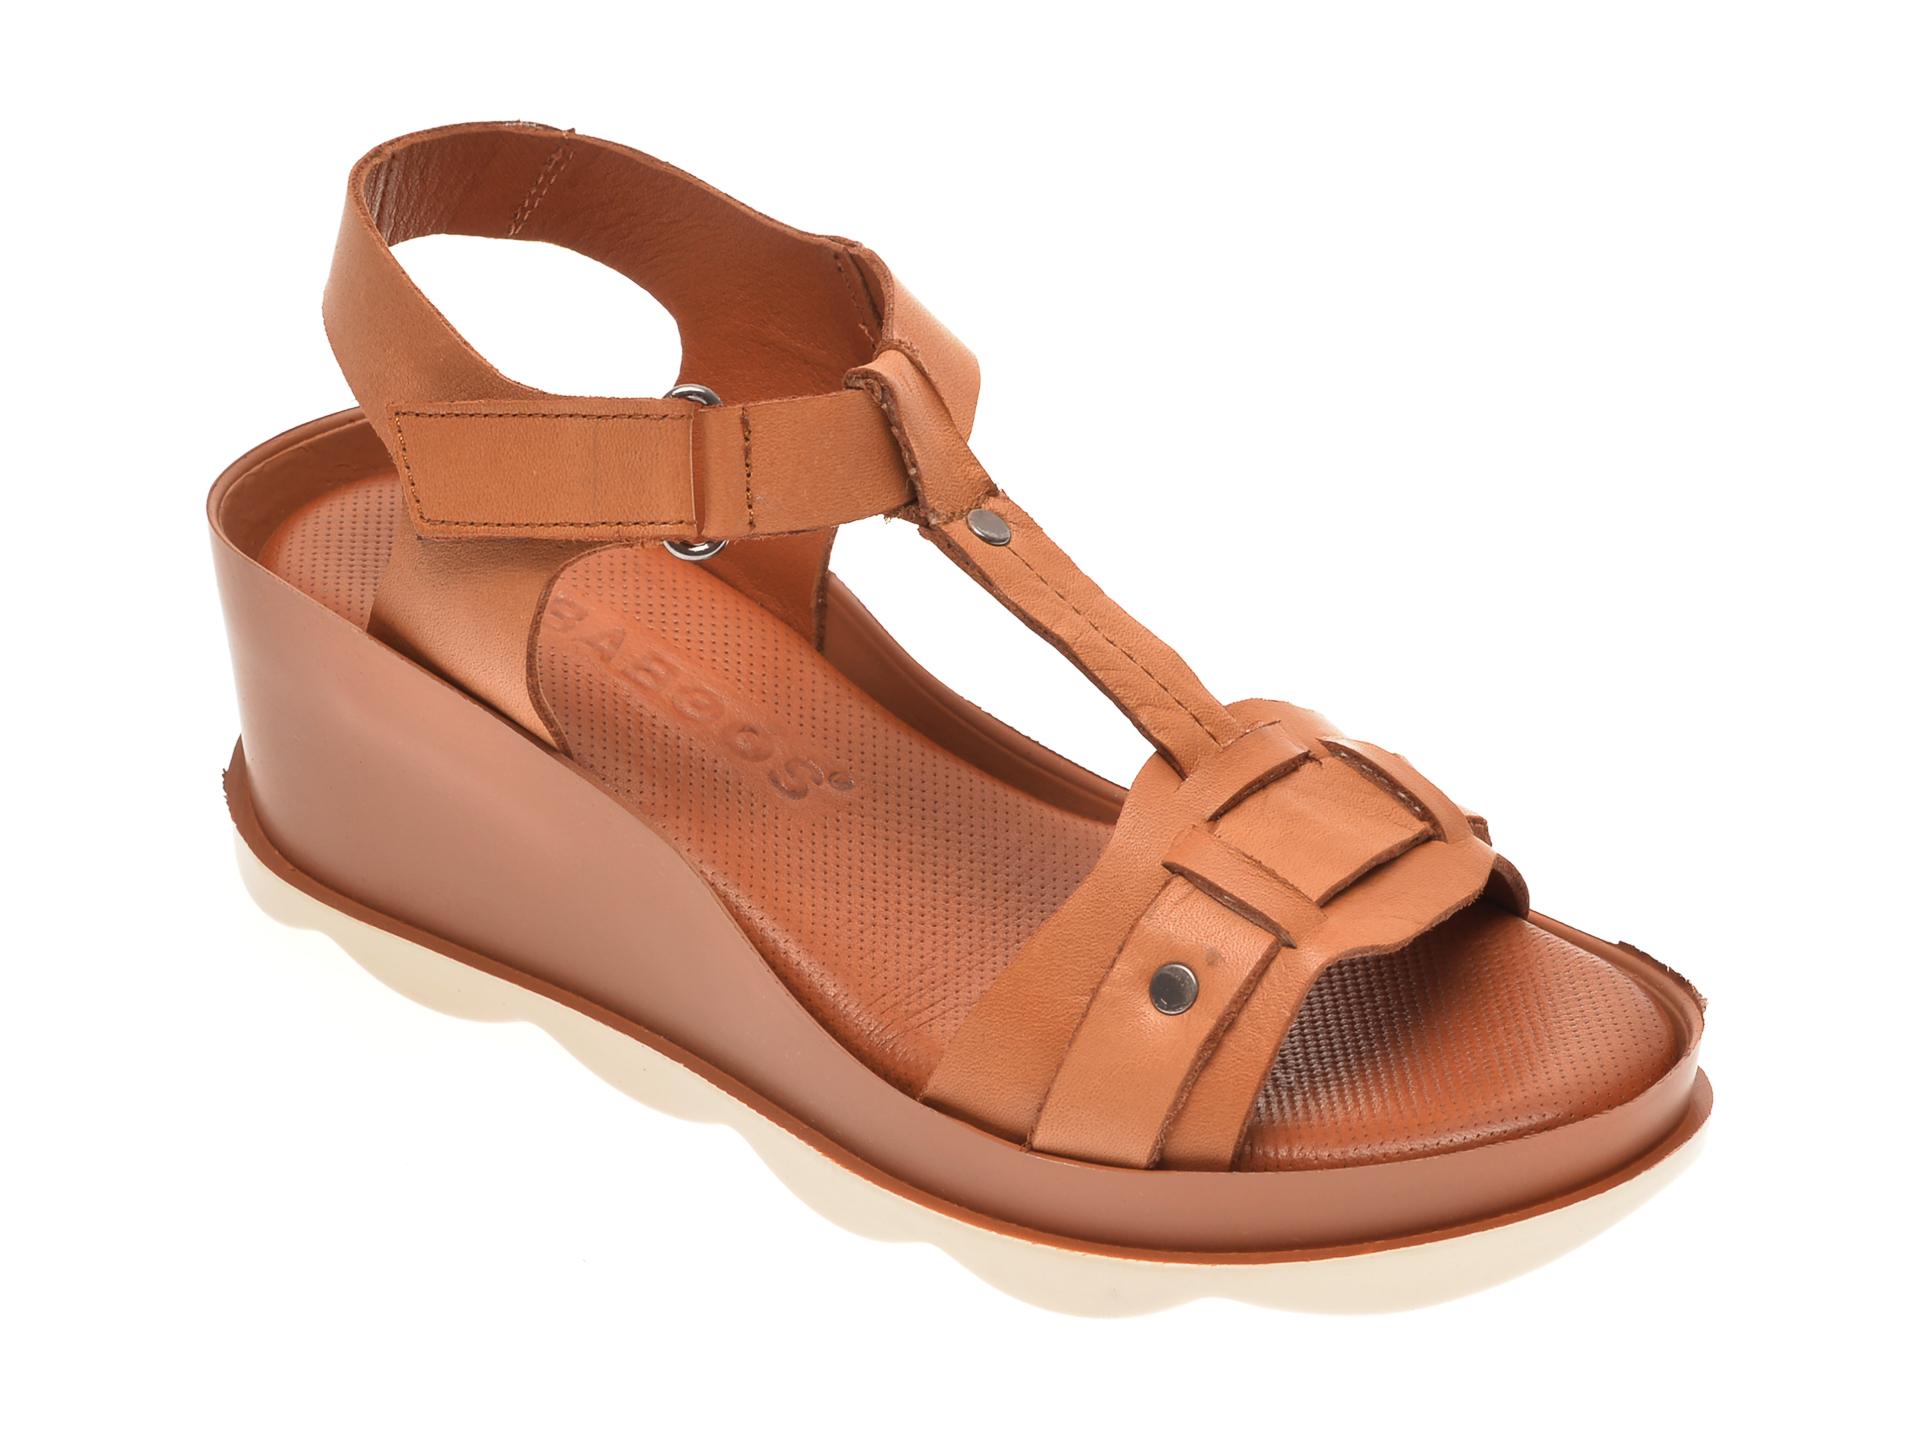 Sandale BABOOS maro, 0502, din piele naturala New